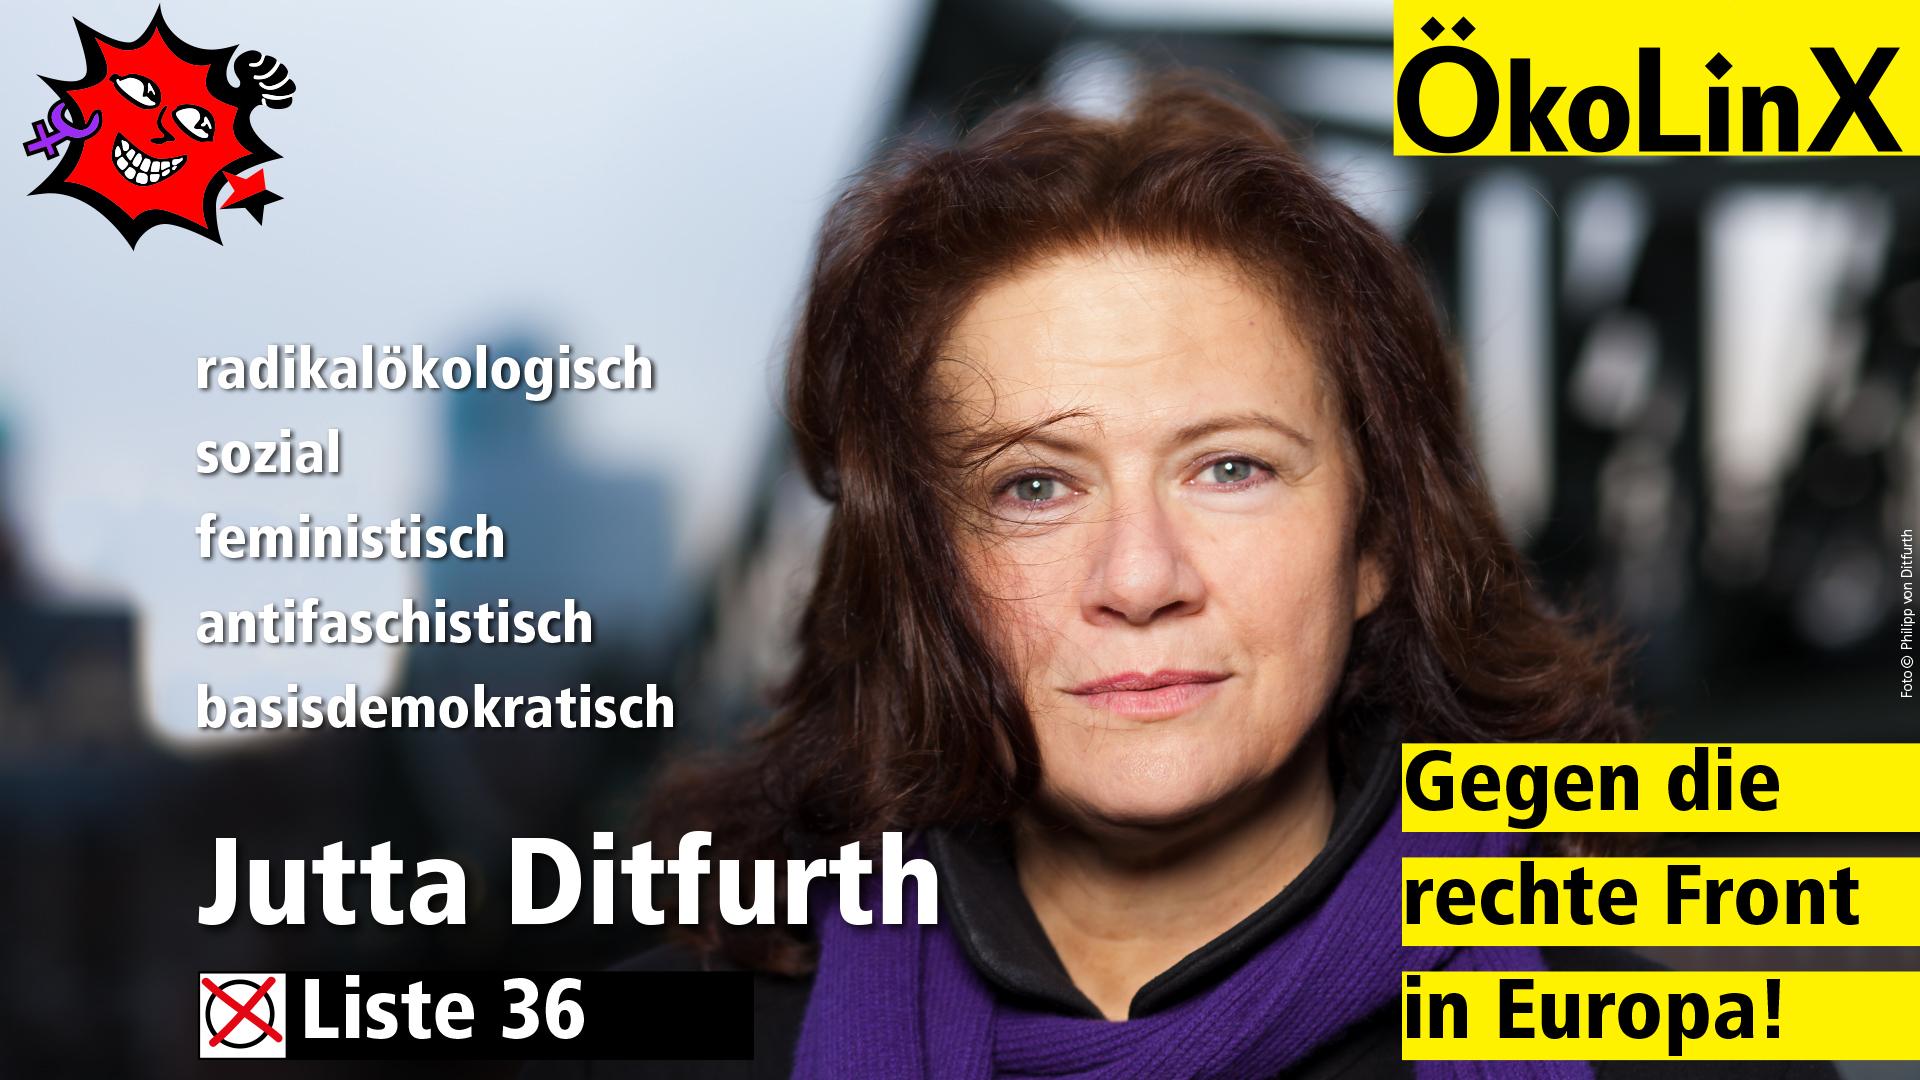 Jutta Ditfurth: Wählt bei der Europawahl ÖkoLinX  Wahlspot (Rundfunk)